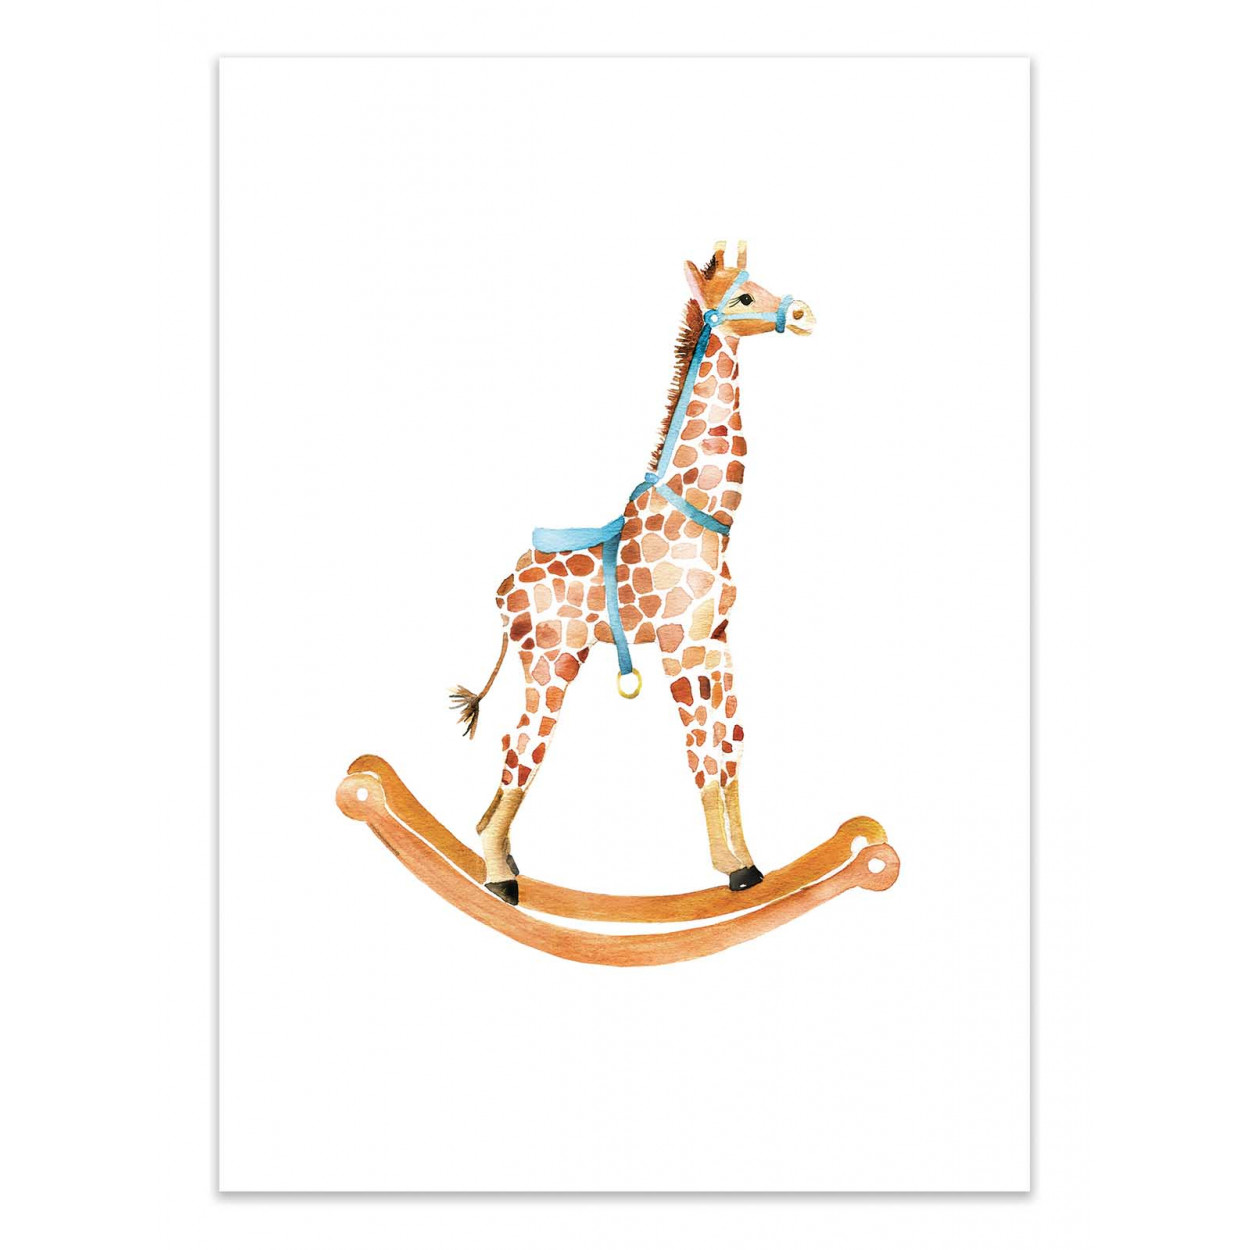 ROCKING GIRAFFE - MERCEDES LOPEZ CHARRO -  Affiche d'art 50 x 70 cm